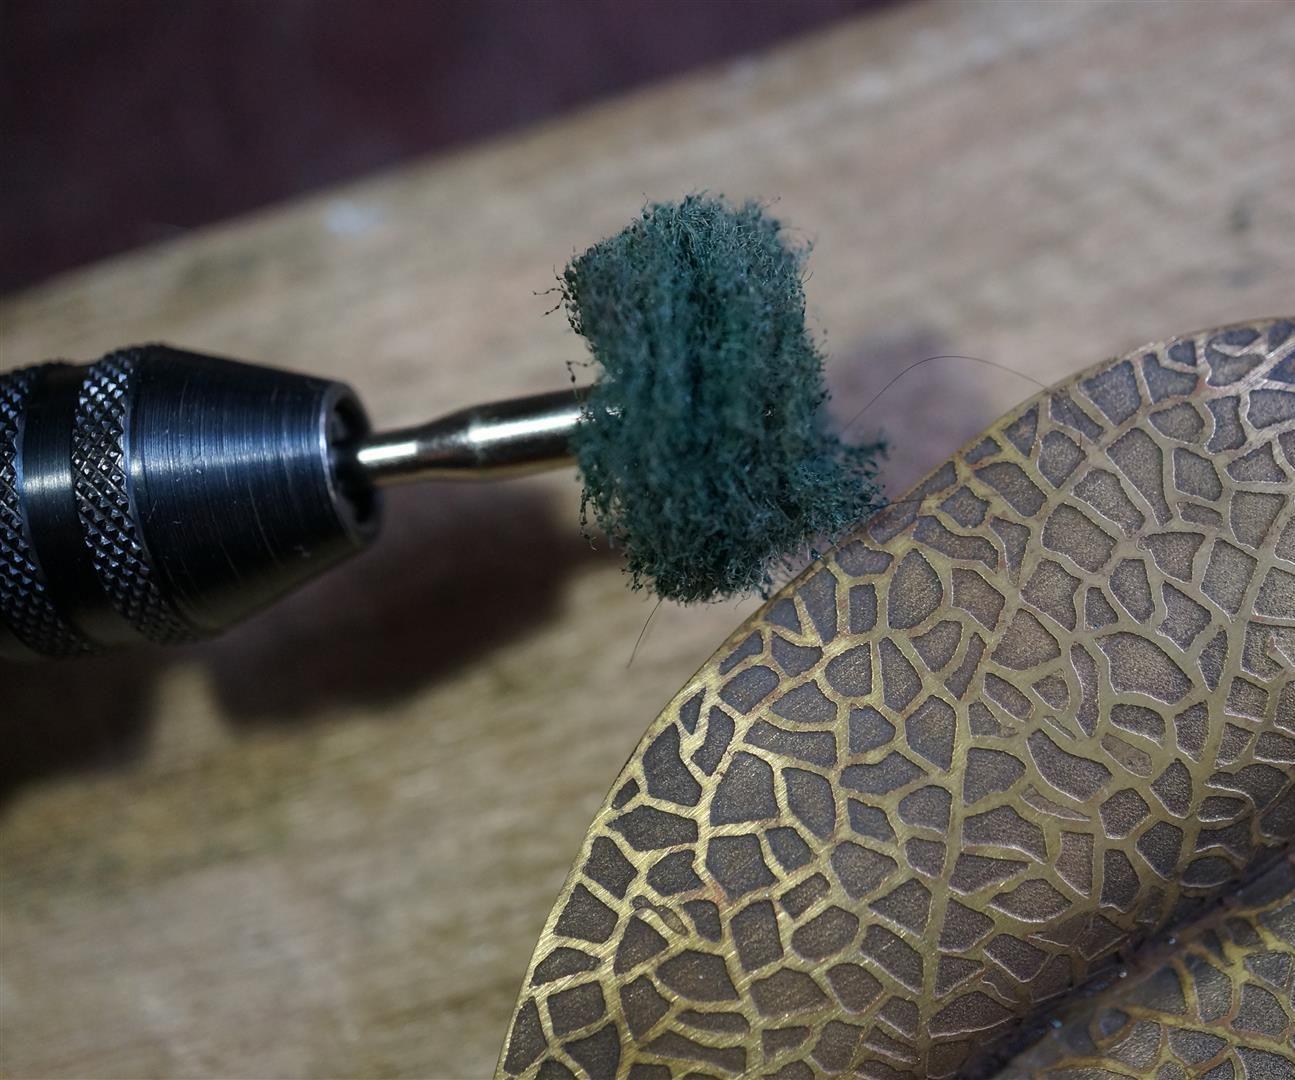 Satin Finishing Wheel For Your Dremel Foredom Flexishaft Mini Drill Dremel Jewelry Making Tools Jewellery Making Courses